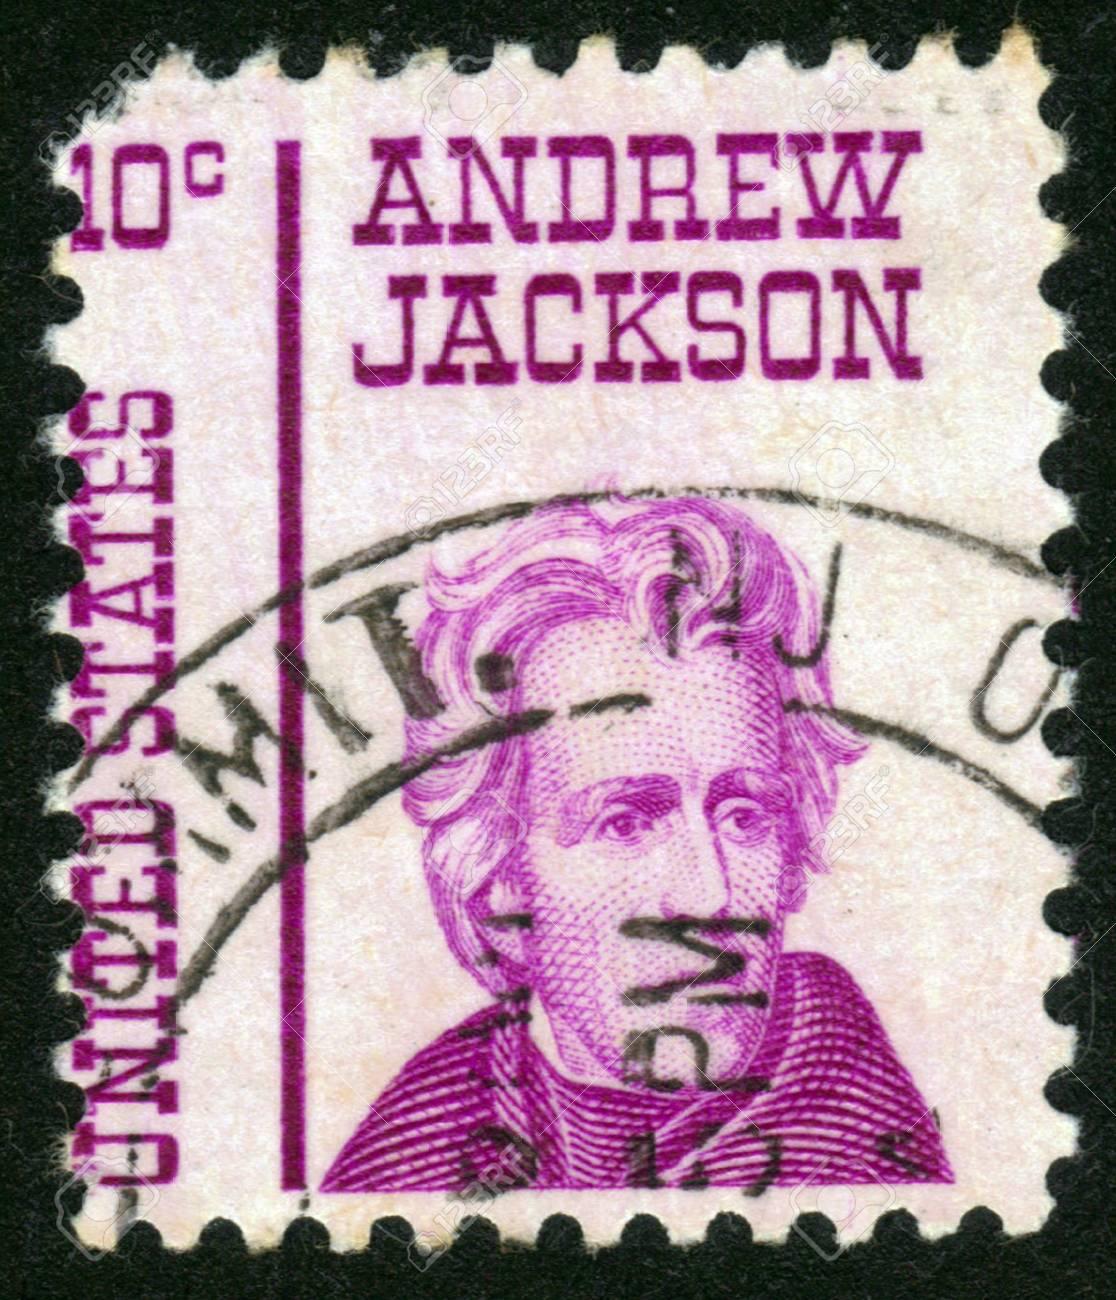 UNITED STATES OF AMERICA - CIRCA 1967: a stamp printed in the United States of America shows Andrew Jackson, 7th President of USA 1829-1837, circa 1967 Stock Photo - 14136841